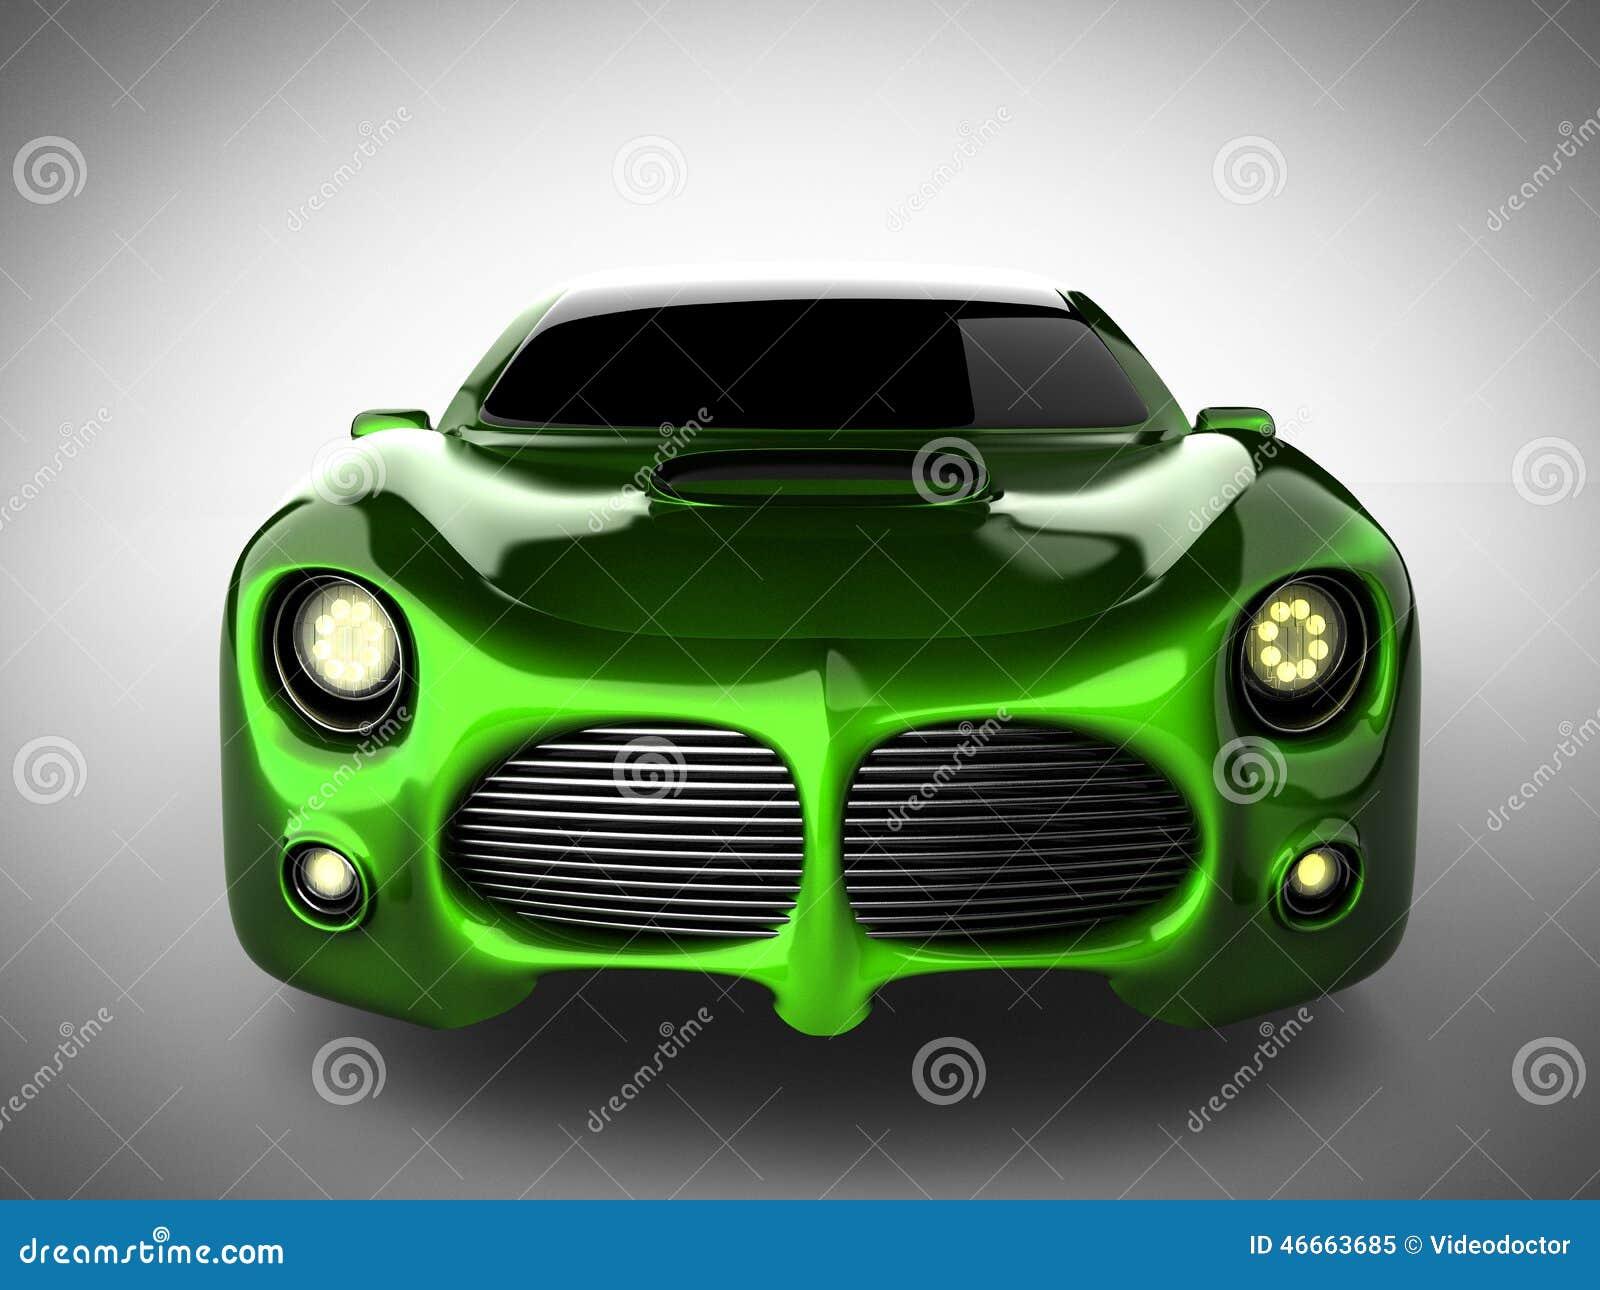 voiture de sport brandless de luxe verte sur le fond blanc illustration stock image 46663685. Black Bedroom Furniture Sets. Home Design Ideas